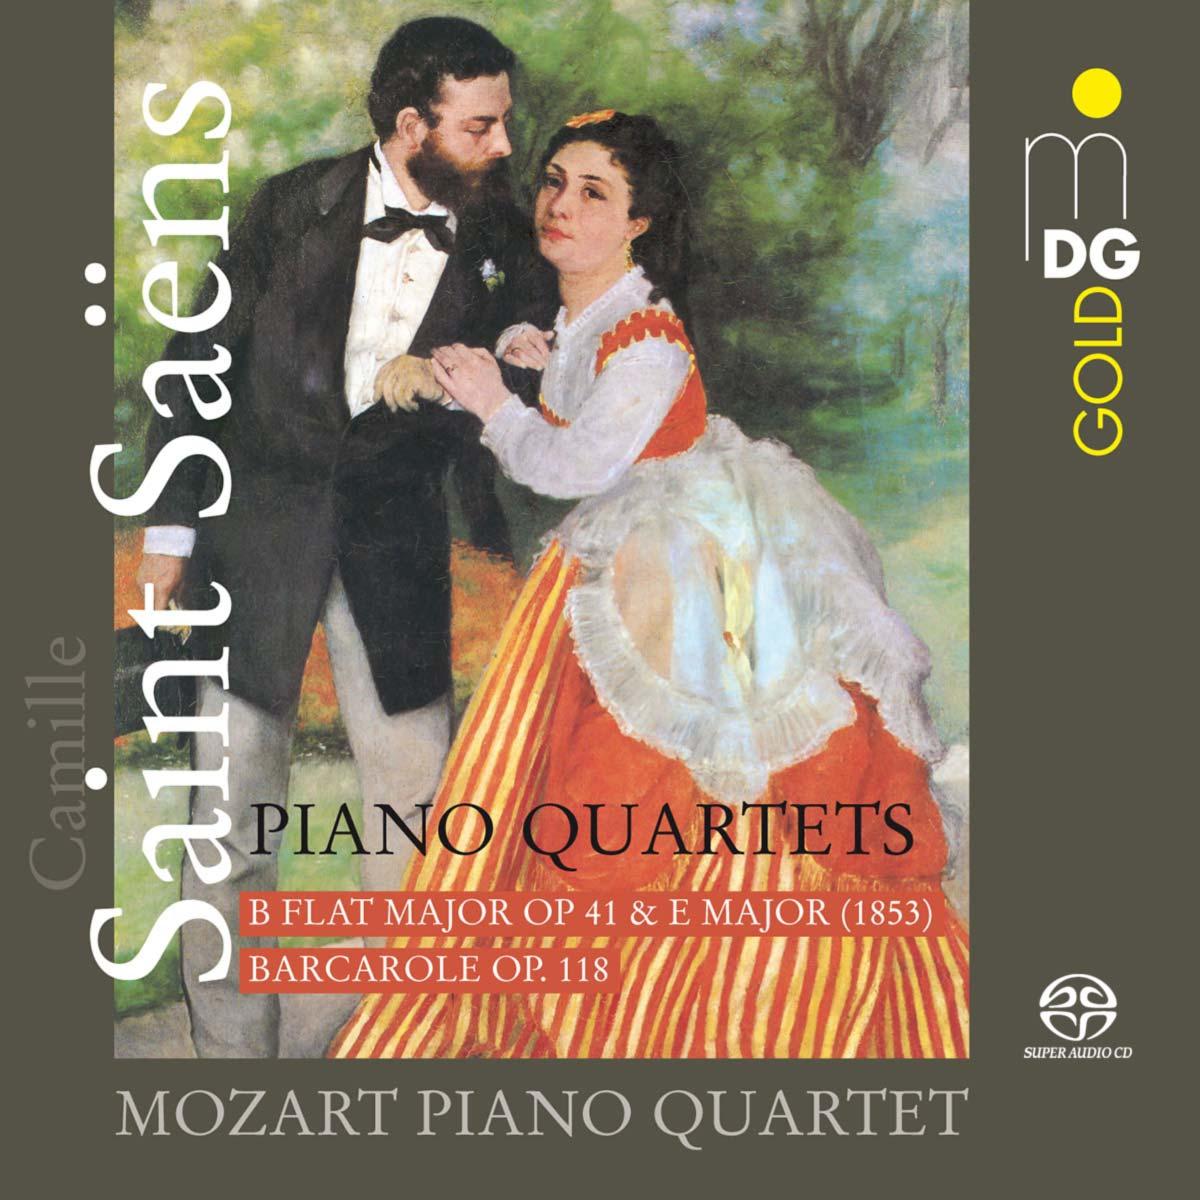 CD Camille Saint-Saëns - Complete Piano Quartets by the Mozart Piano Qartet, Cover © Dabringhaus und Grimm Audiovision GmbH